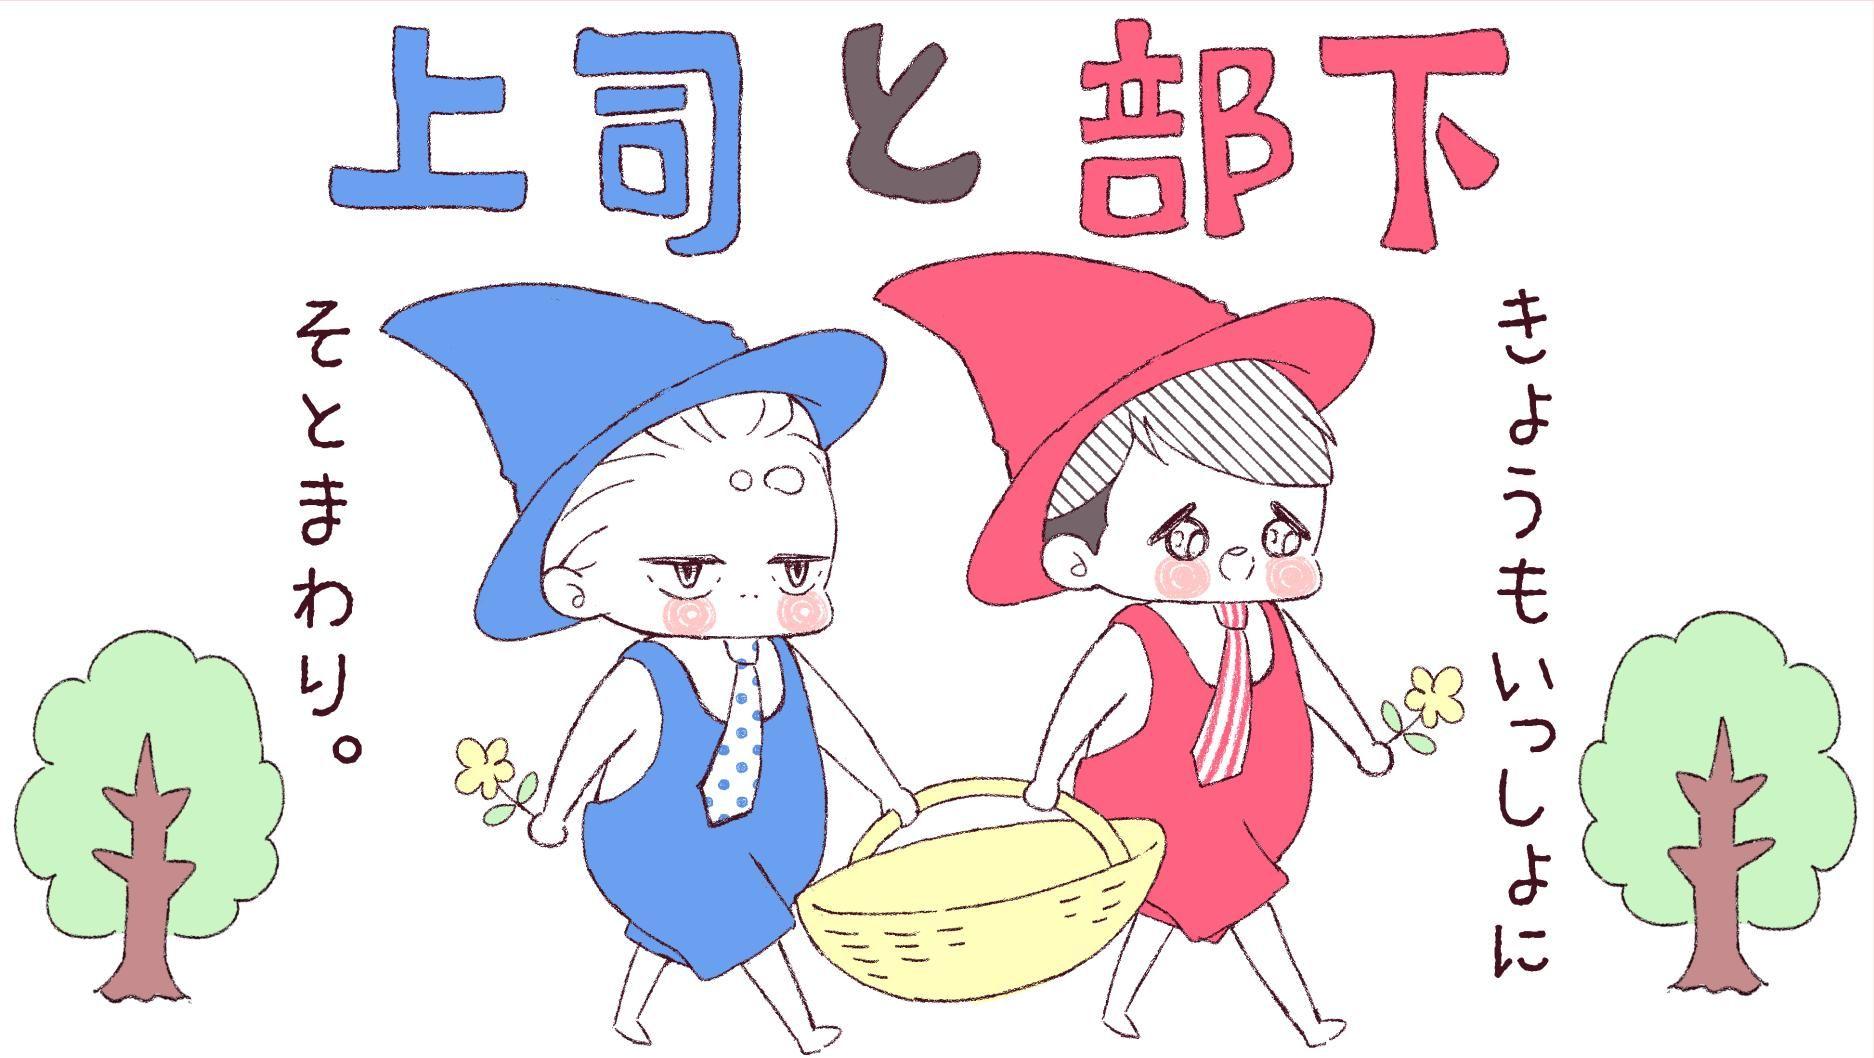 ゲイ 漫画 忘年会